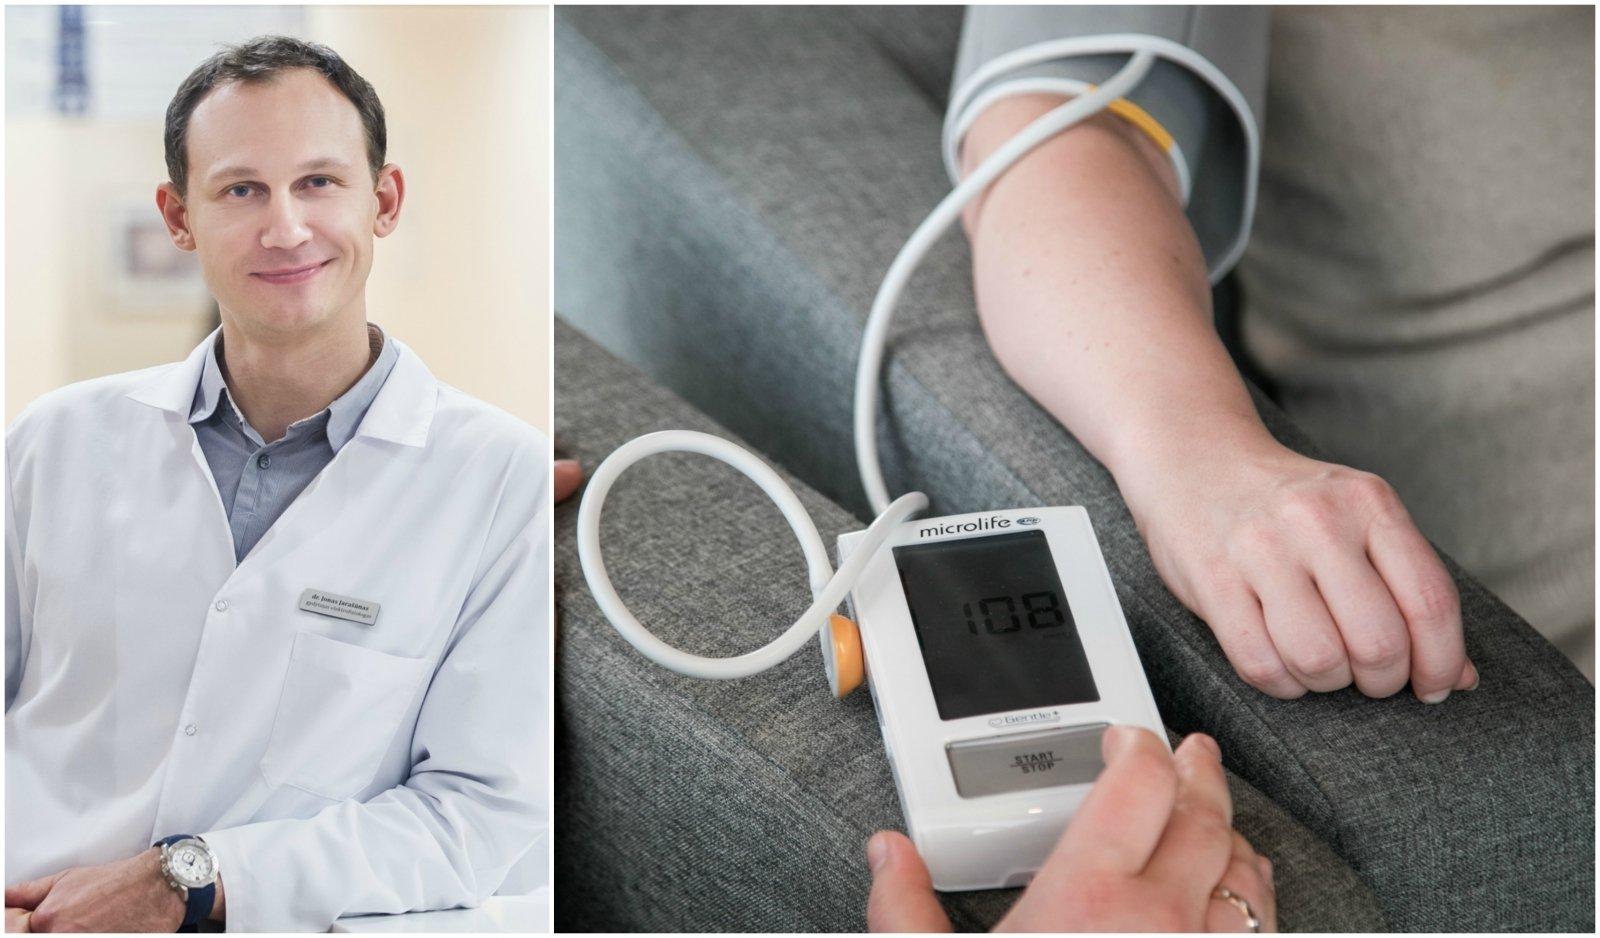 kodėl jaunimo hipertenzija